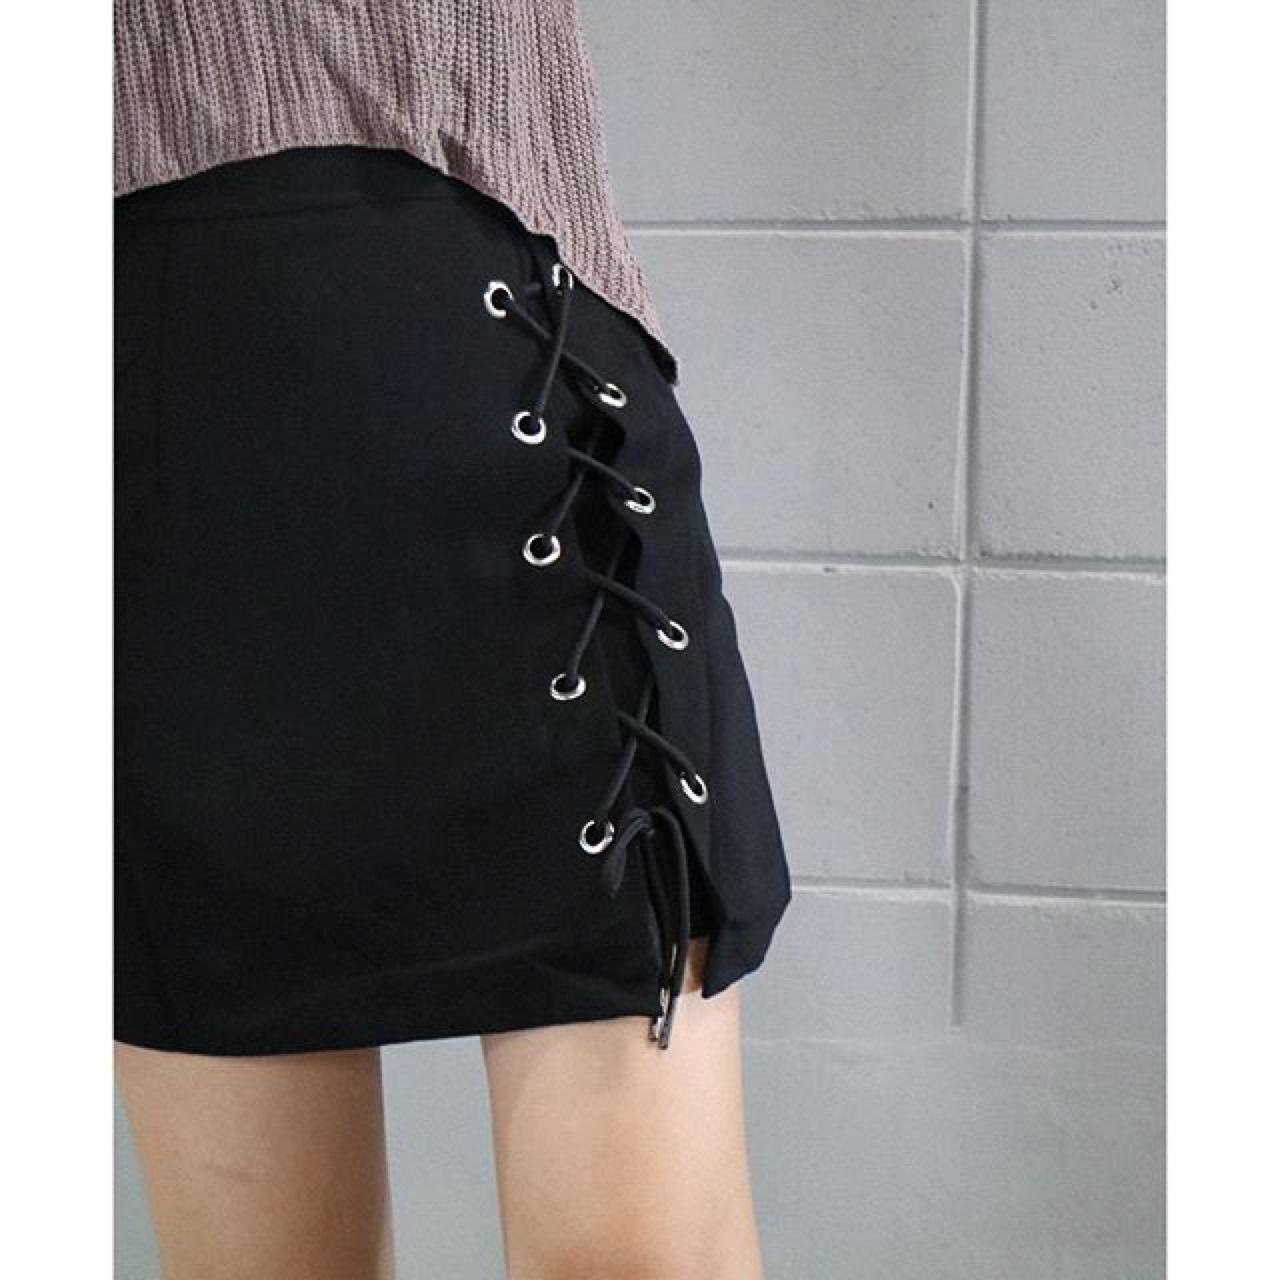 AWEARNESS,Skirt,กระโปรง,กระโปรงทรงเอ,ทรงเอ